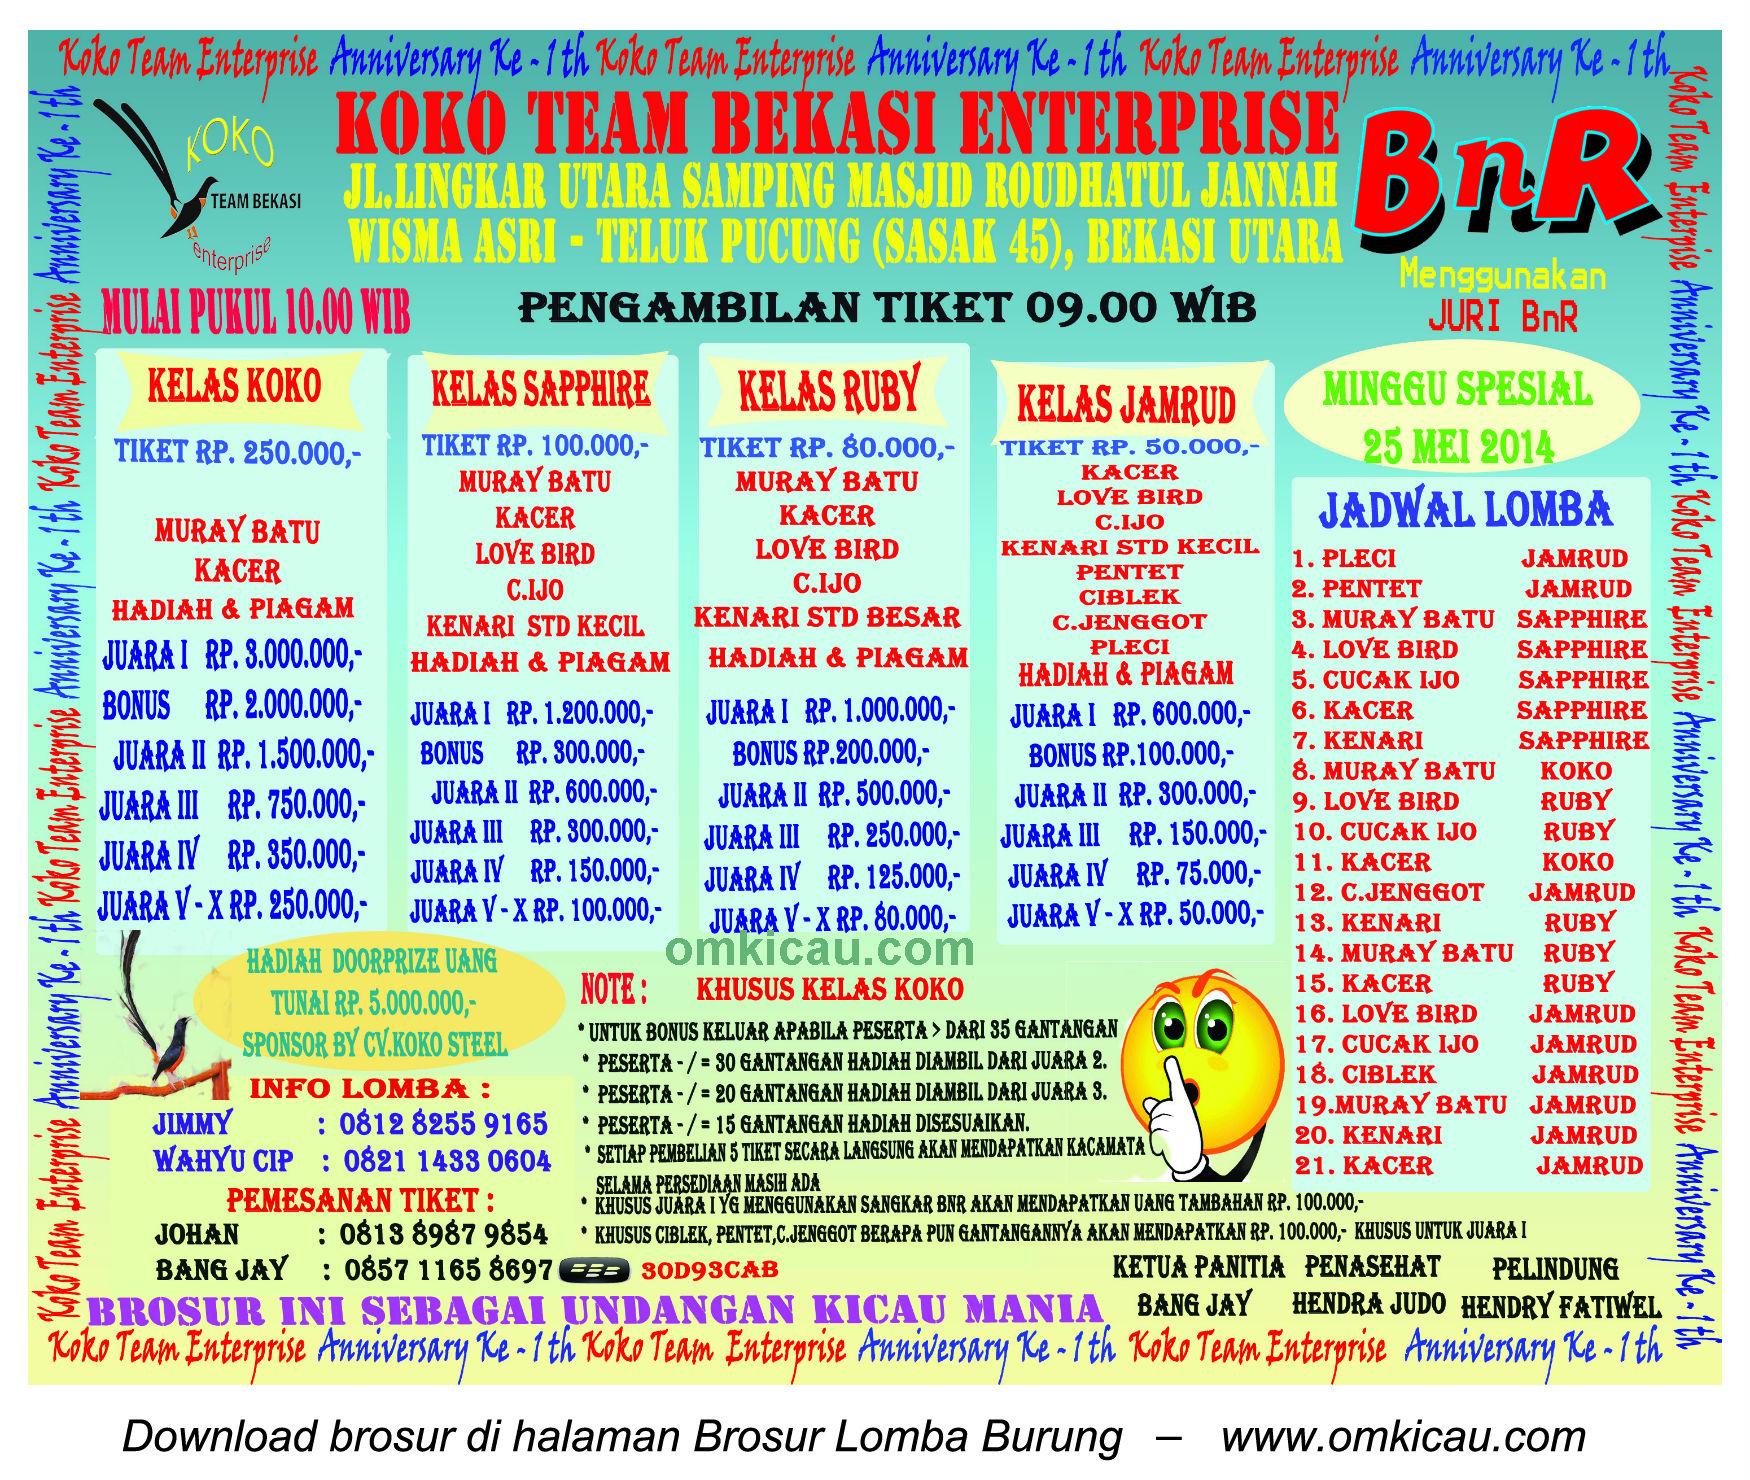 Brosur Lomba Burung Berkicau 1st Anniversary Koko Team Enterprise - Bekasi, 25 Mei 2014